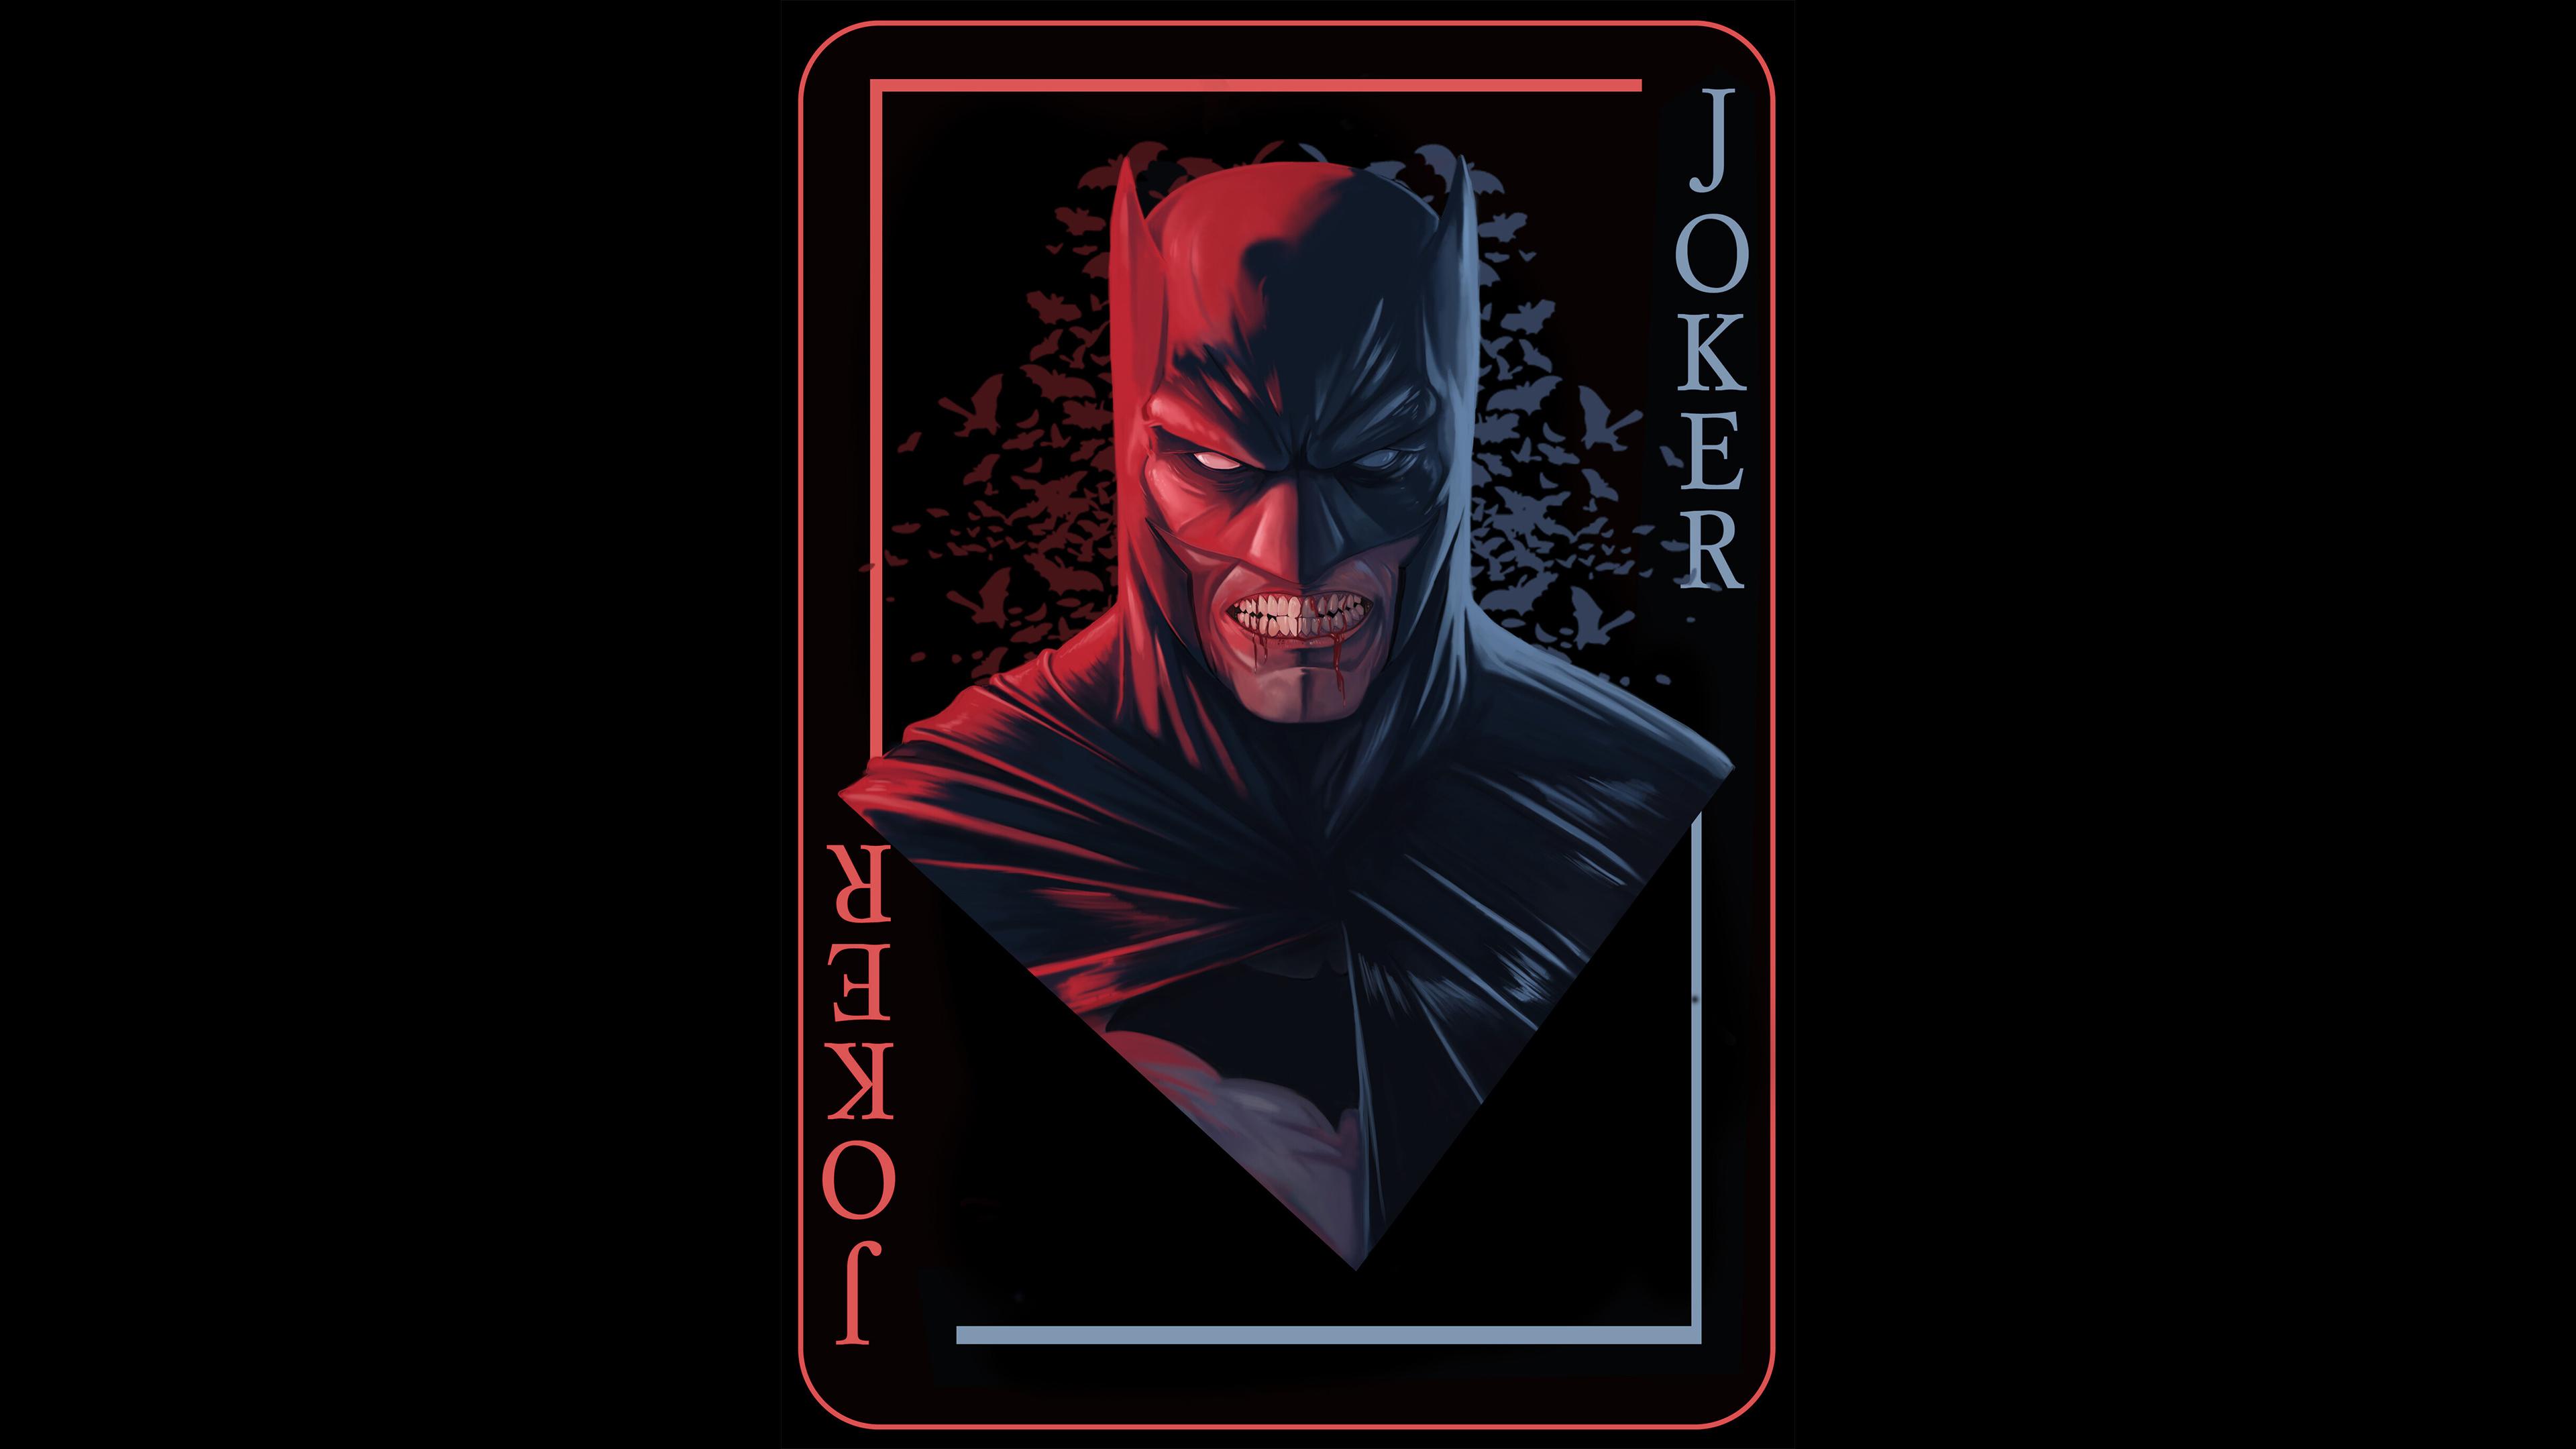 General 3840x2160 digital digital art artwork Batman black red dark black background lights Joker simple background fictional character Bruce Wayne DC Comics DC Universe superhero